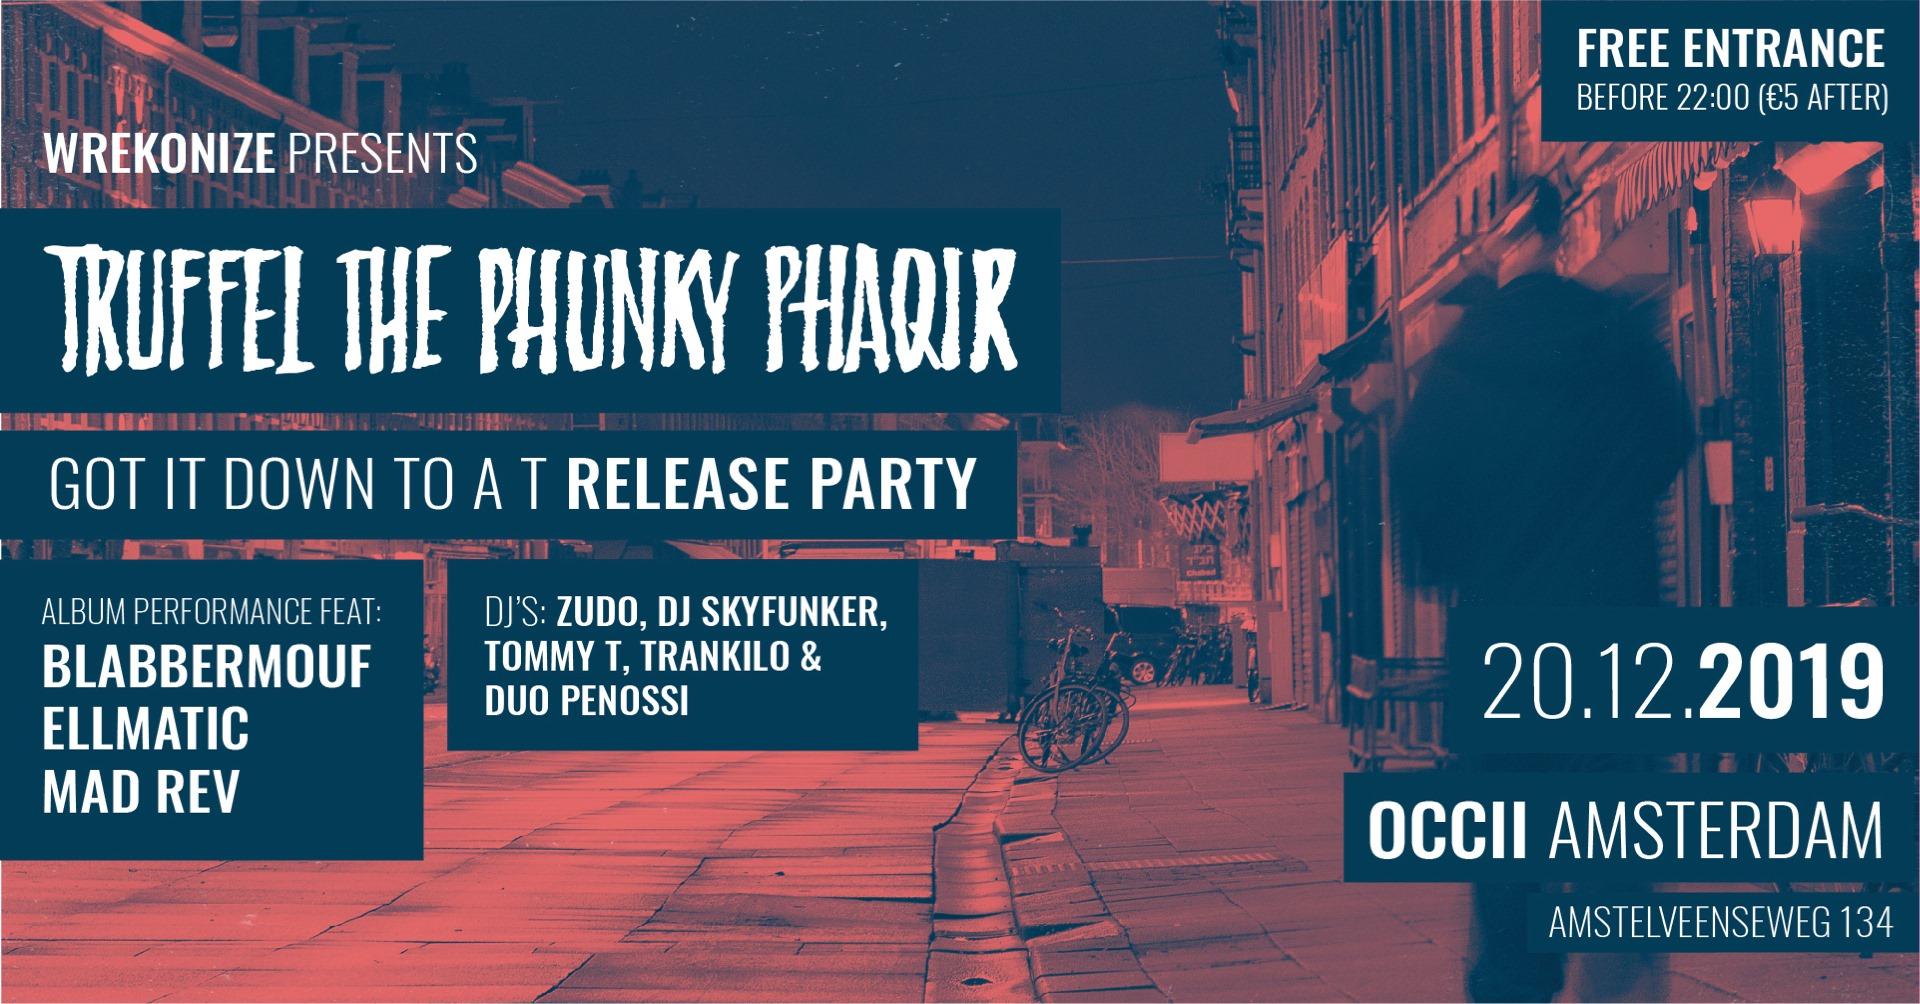 Truffel The Phunky Phaqir + BlabberMouf + EllMatic & Mad Rev Da Surinam Swordsman + DJ's: Zudo, SkyFunker, Tommy T & Duo Penossi + Trankilo